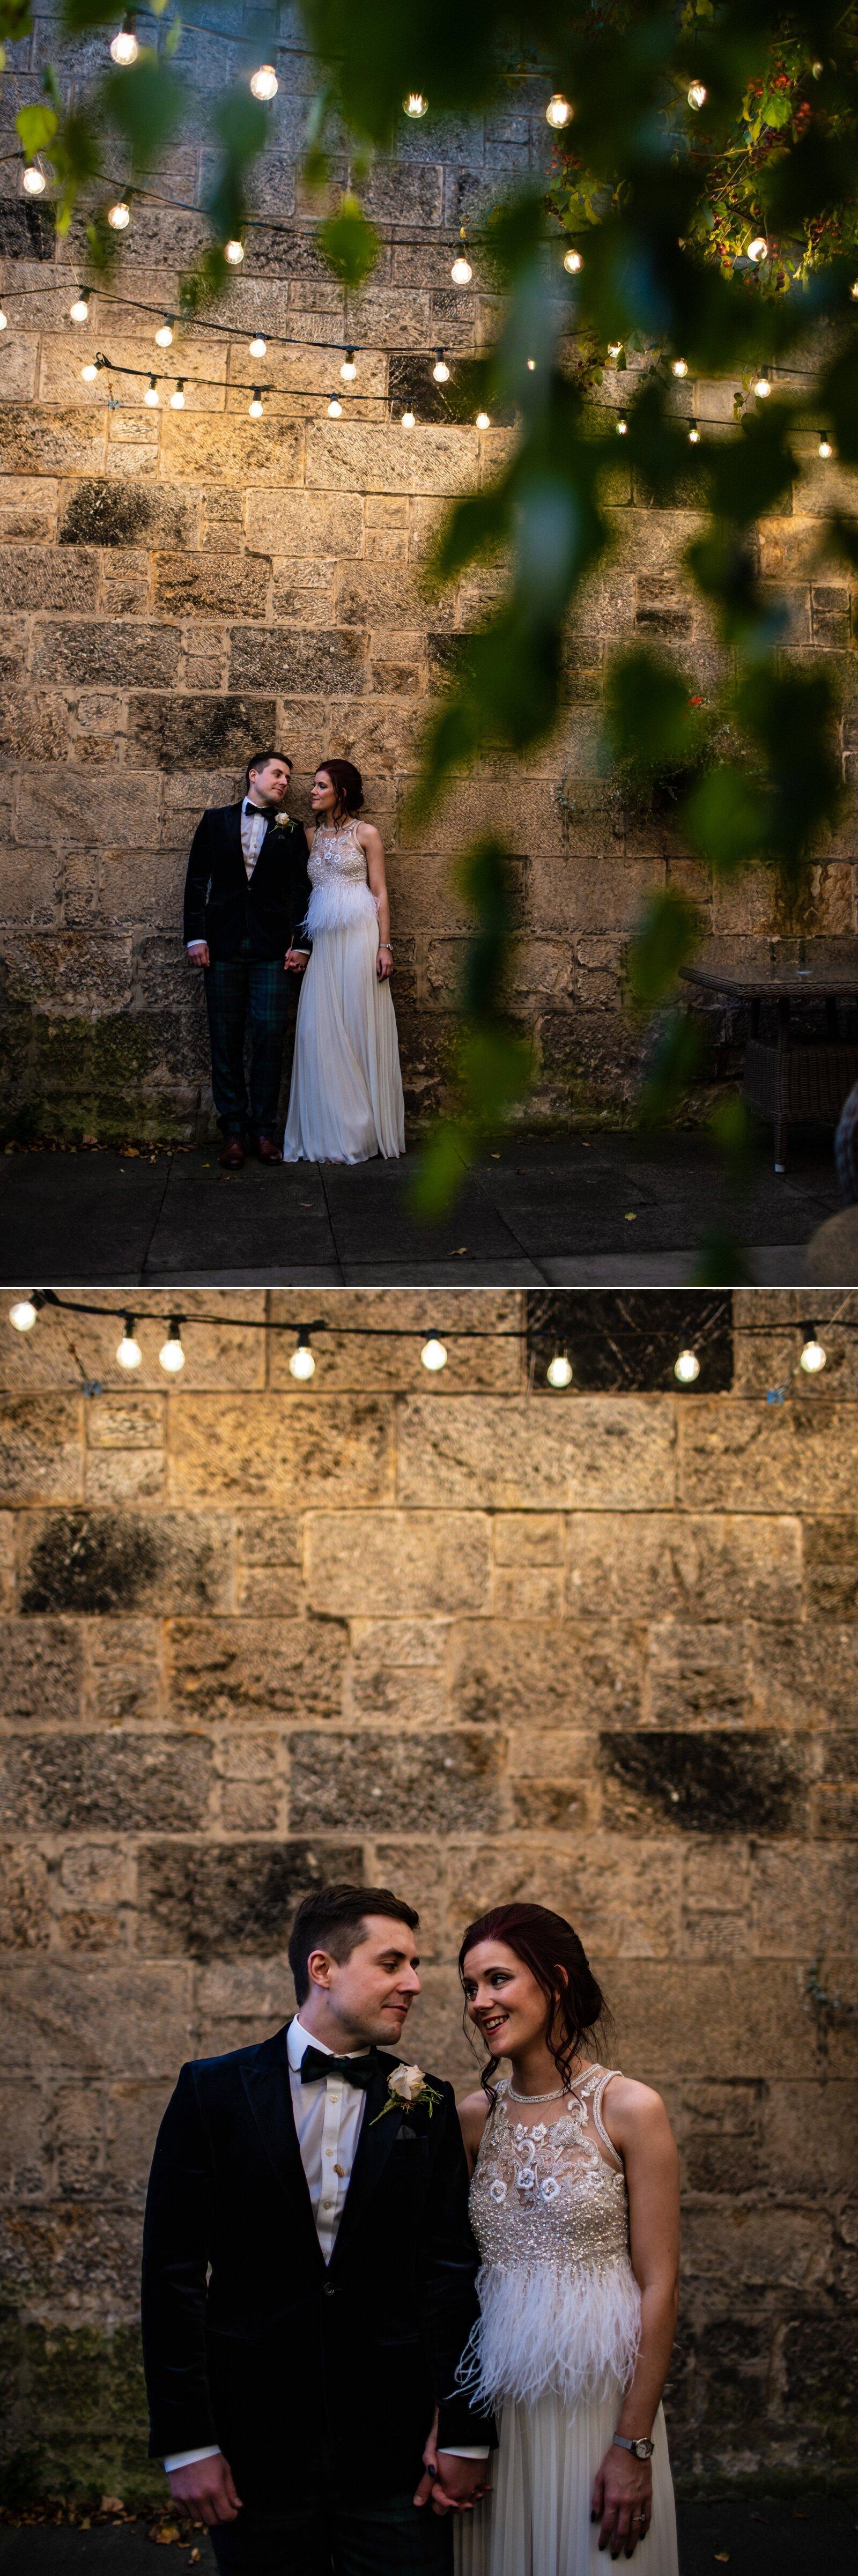 Andy&Szerdi-Photography_Couple_Elaine-Stephen-23.jpg